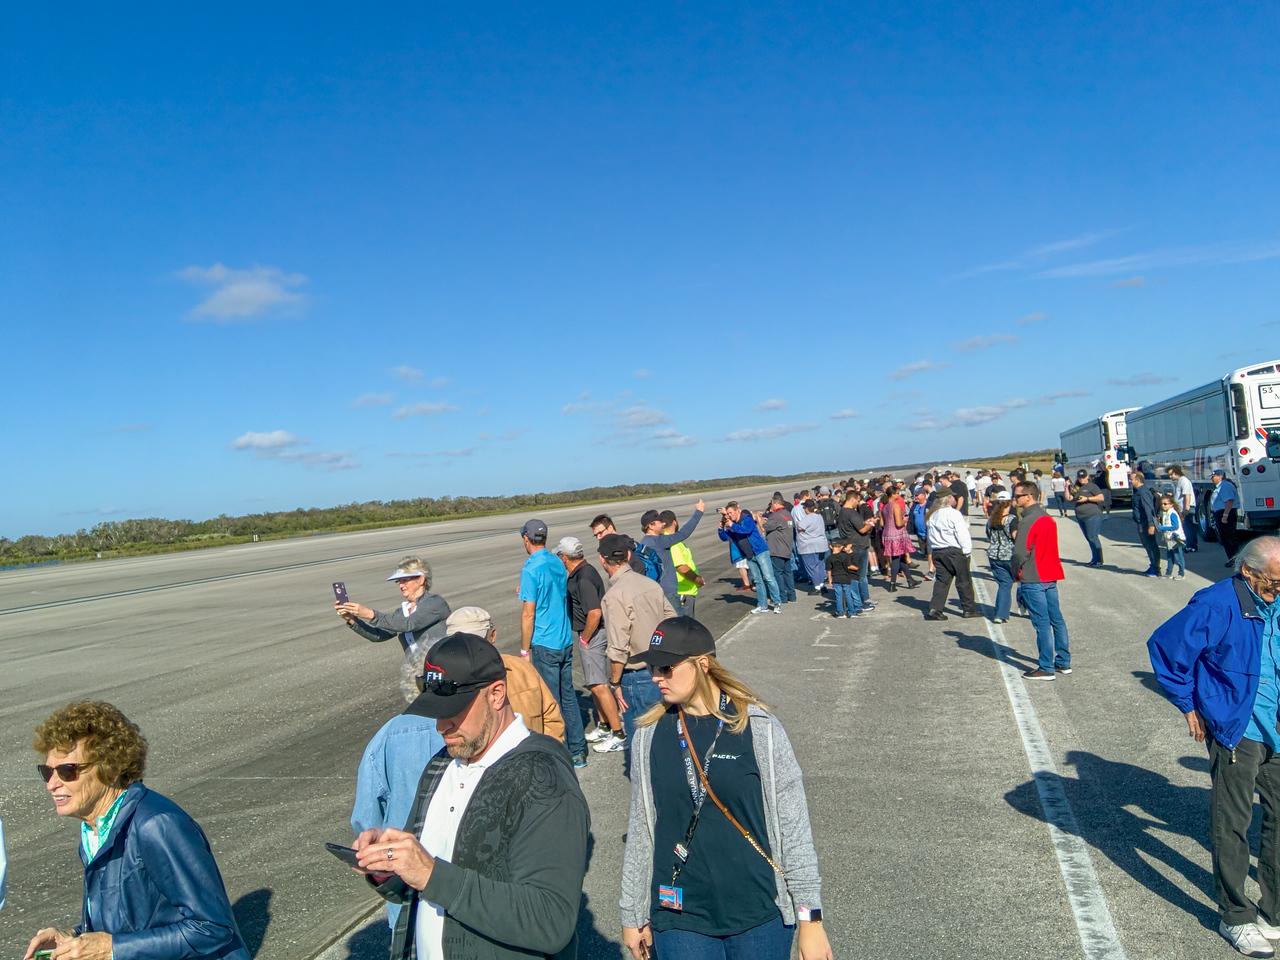 Shuttle Landing Facility, Kennedy Space Center